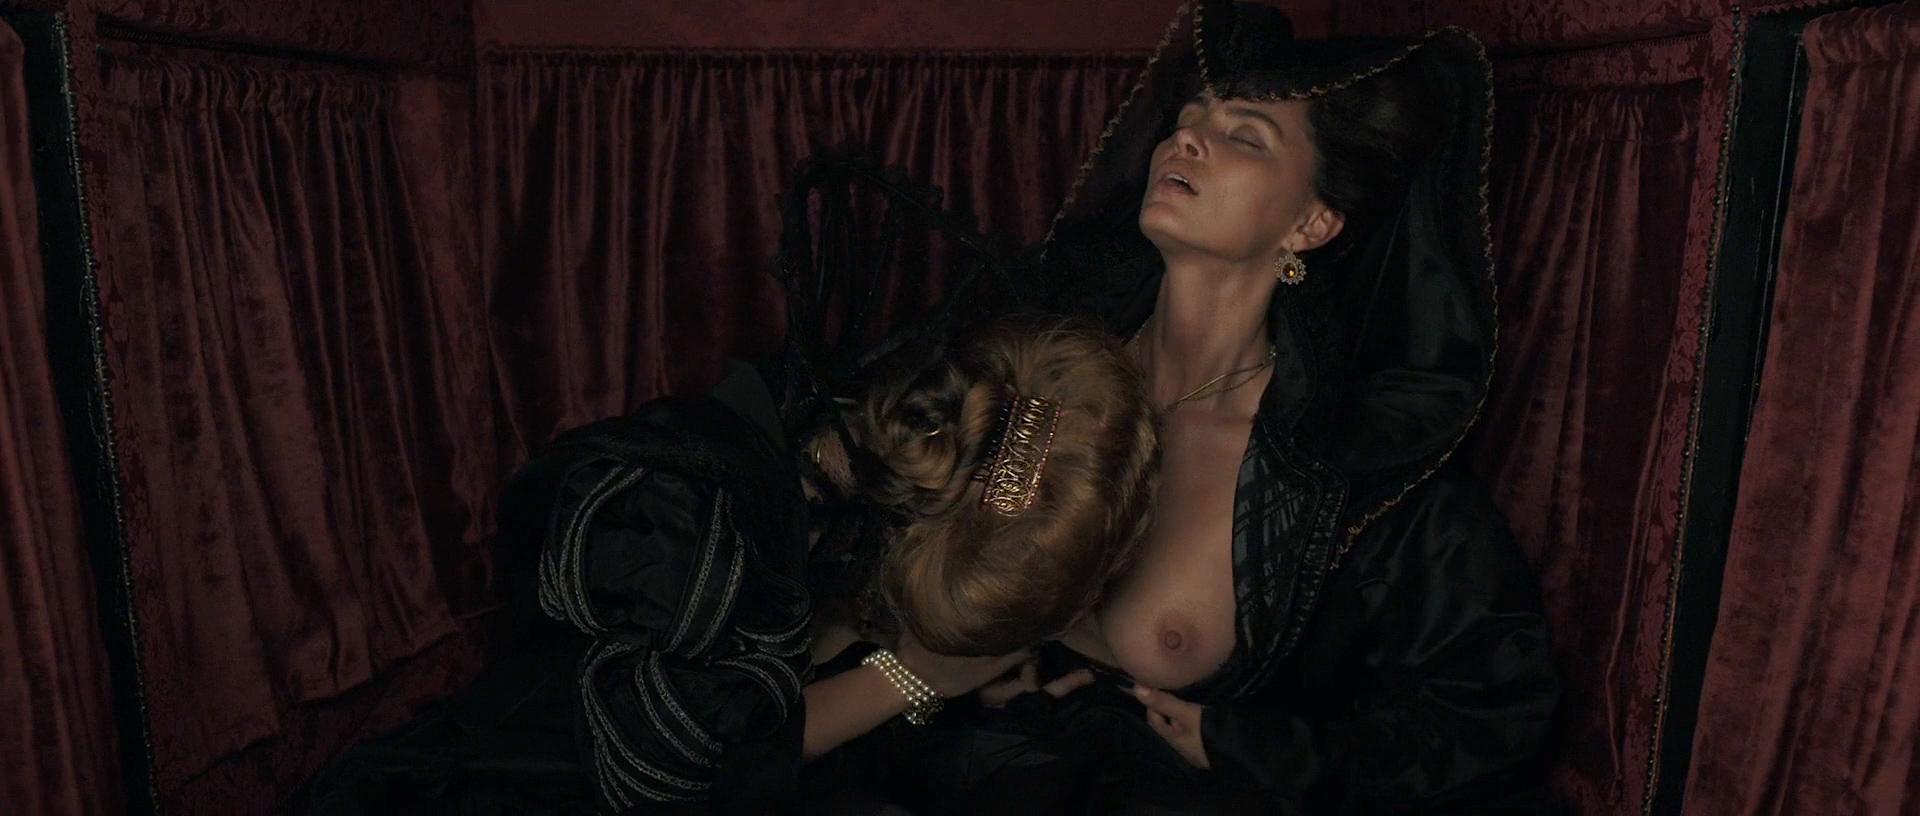 Stacy Martin nude butt others nude - Il racconto dei racconti (2015) hd1080p (12)